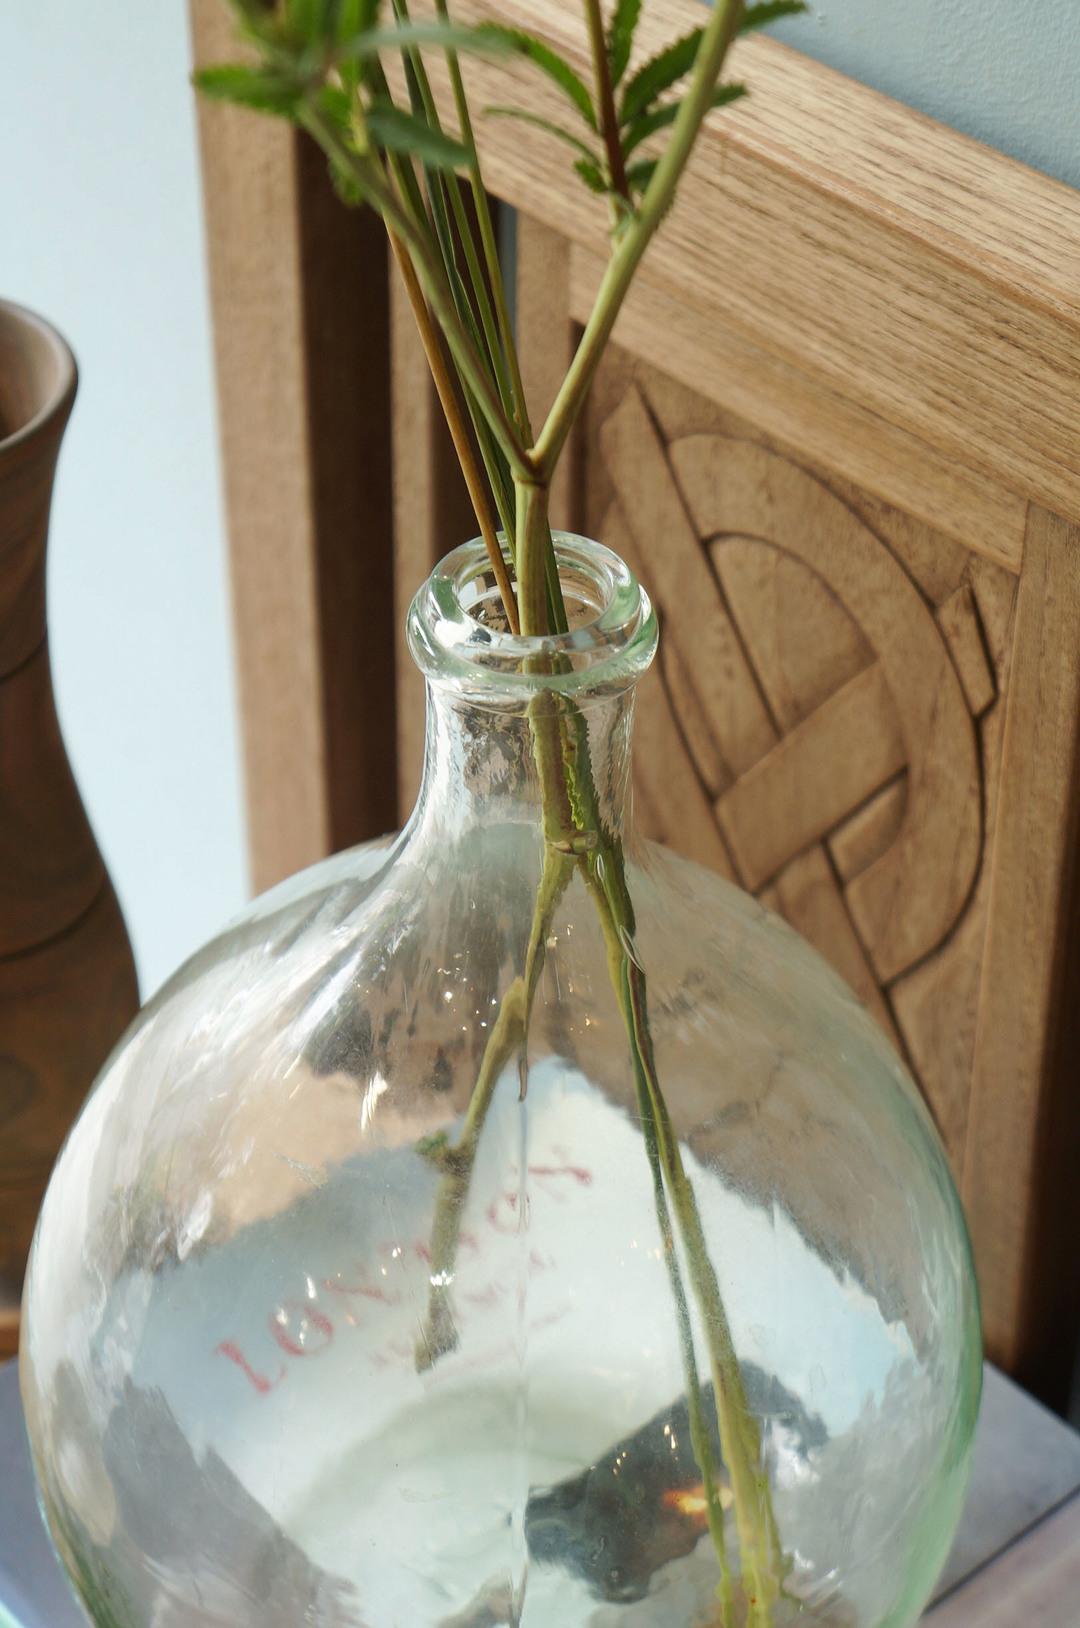 France Antique Demijohn Bottle/フランス アンティーク デミジョンボトル ガラス瓶 フラワーベース 古道具 シャビーシック ブロカント